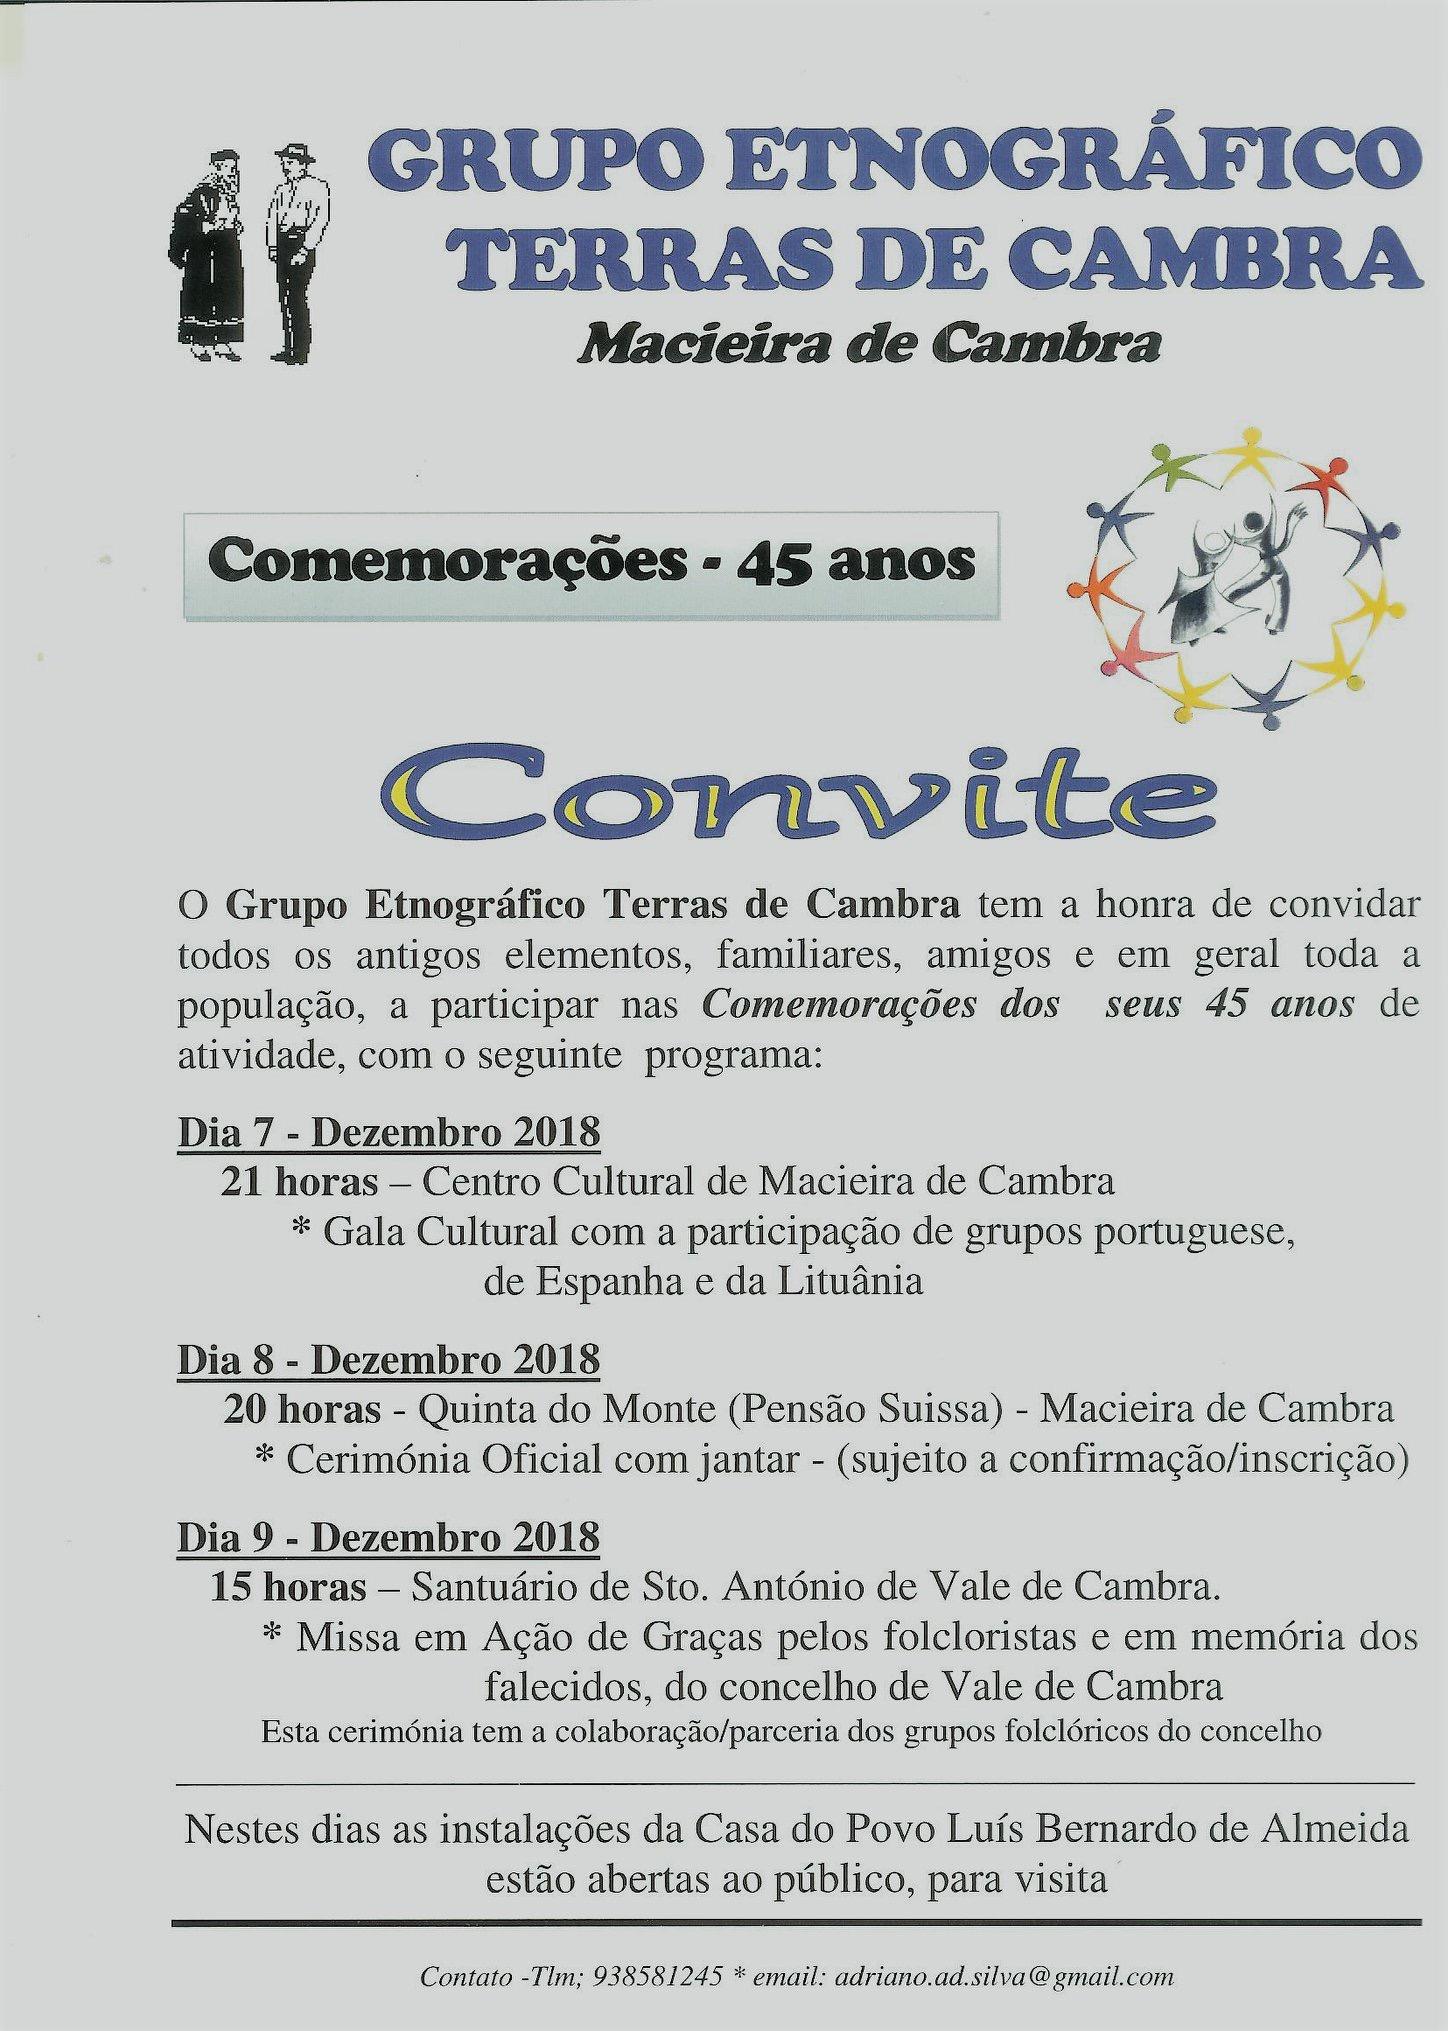 Grupo Etnográfico Terras de Cambra assinala aniversário